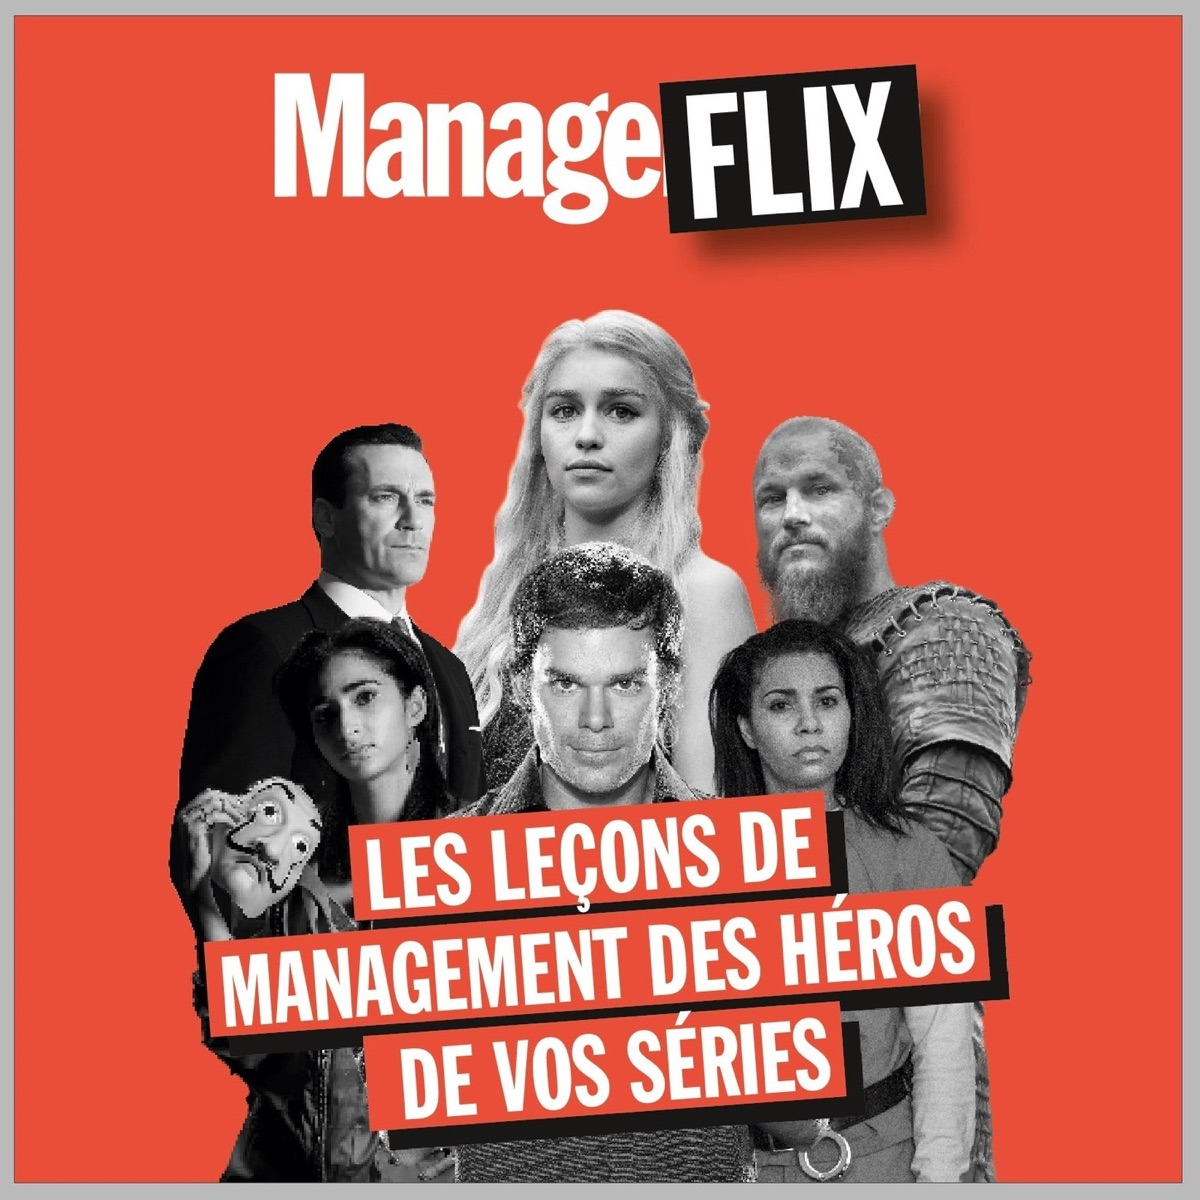 ManageFlix